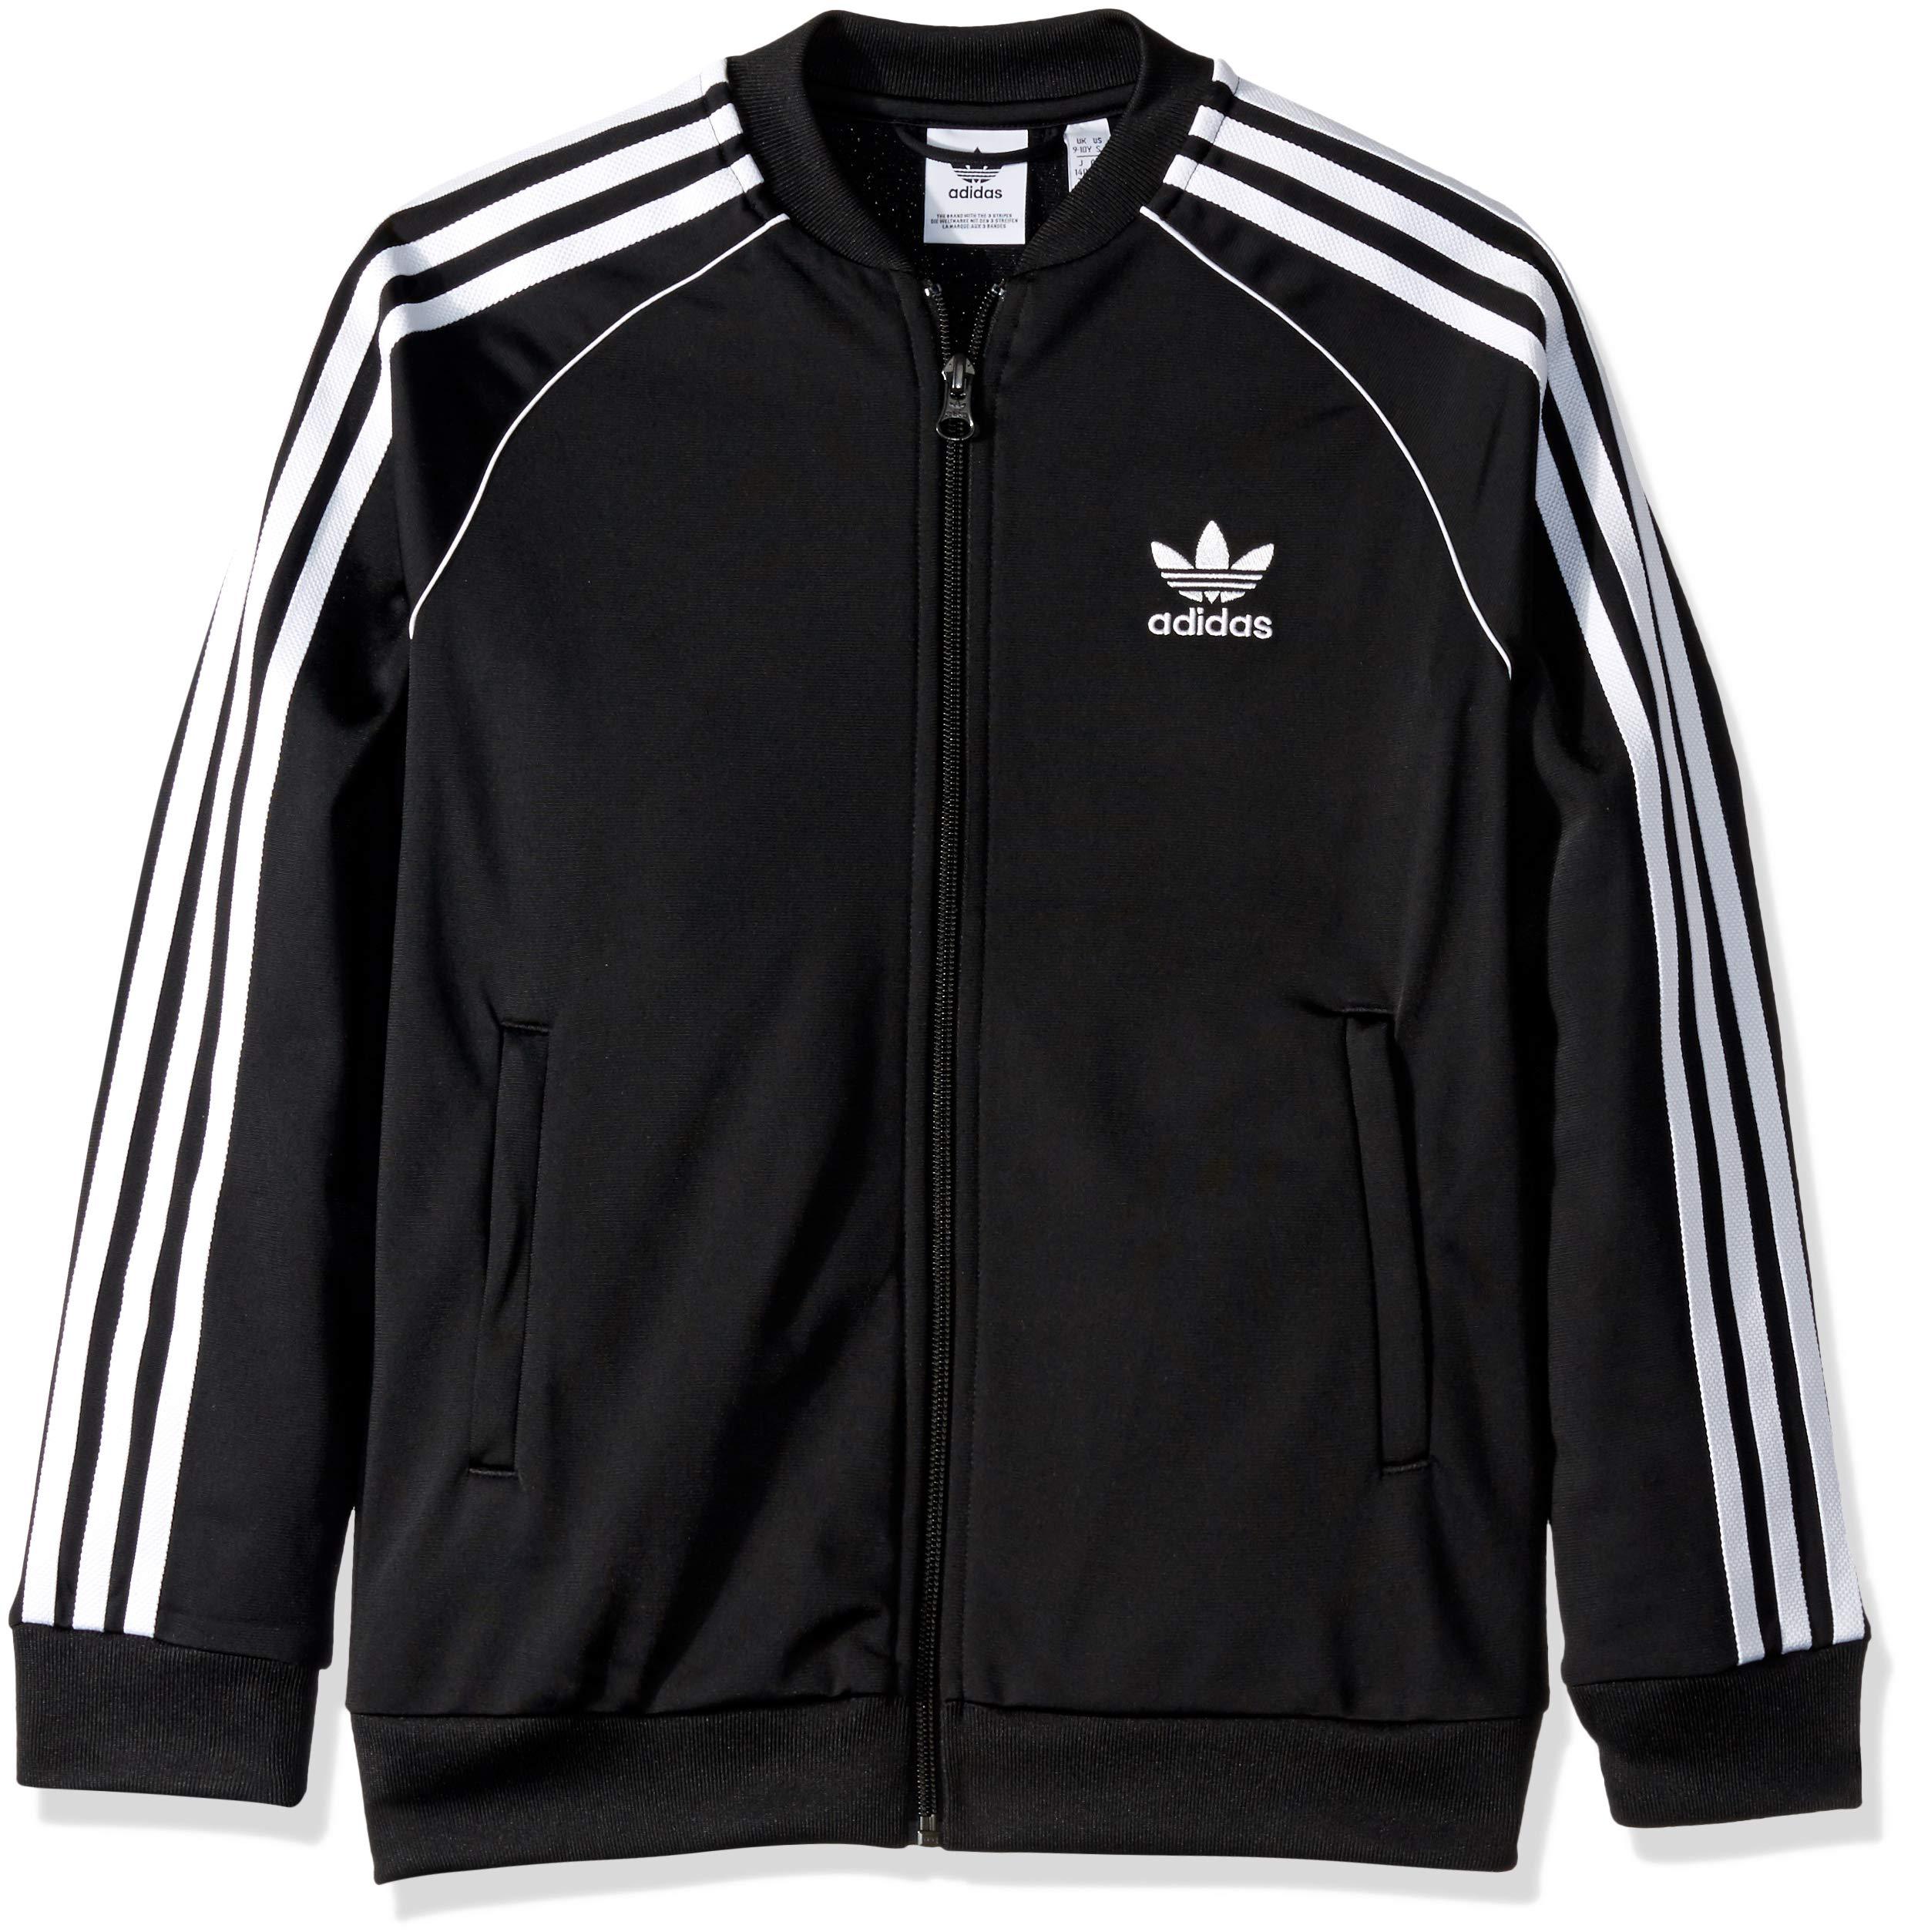 adidas Originals Boys' Big Superstar Jacket, Black/White, X-Large